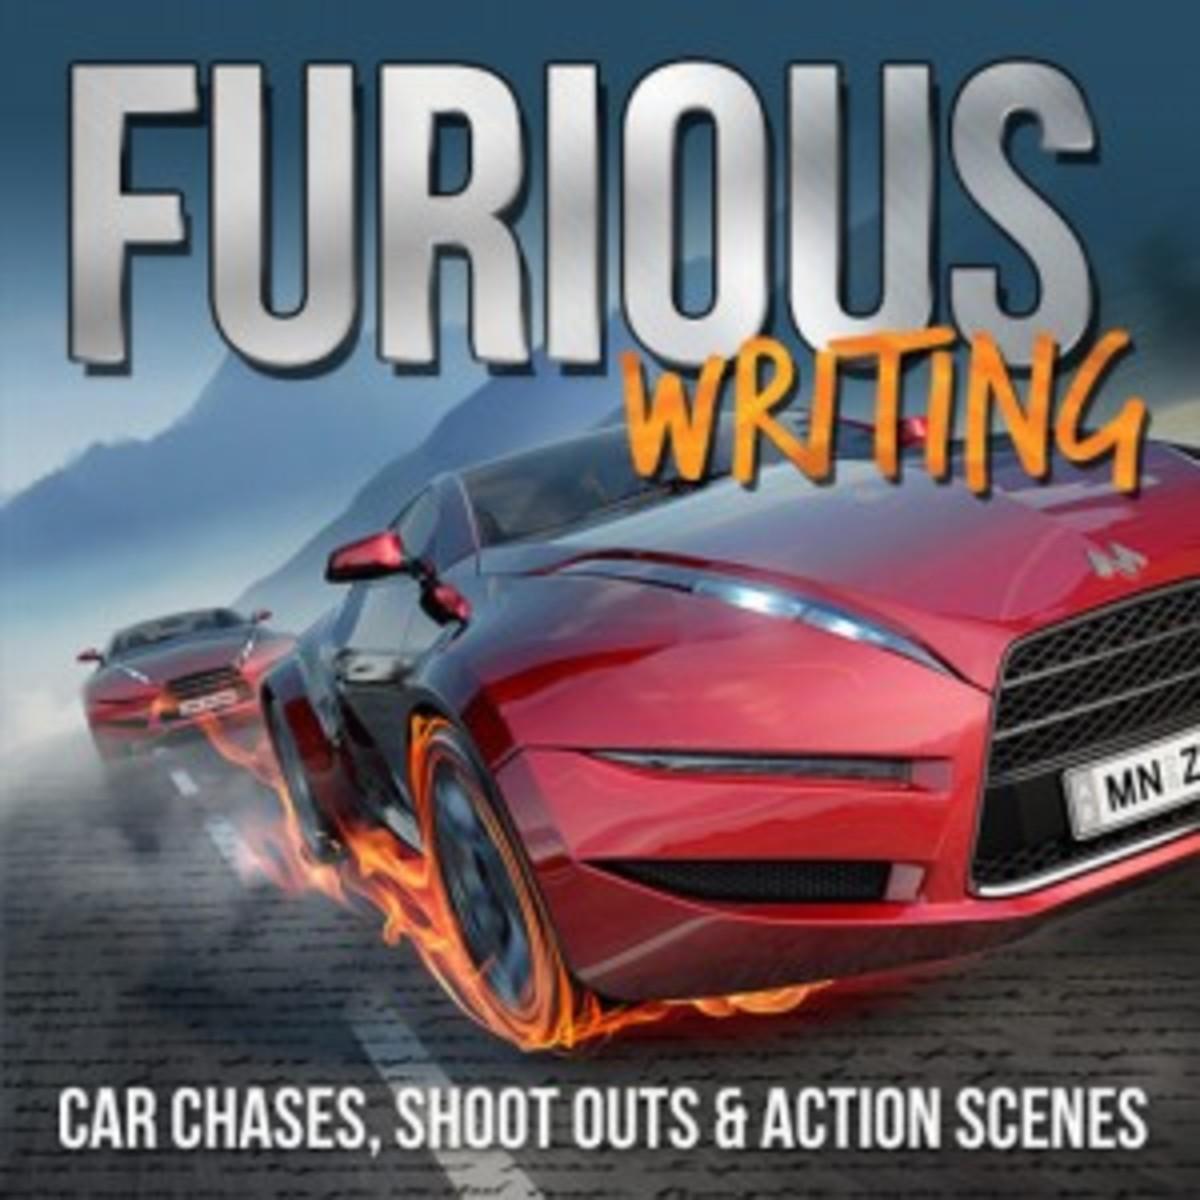 ws_furiouswriting-500_medium